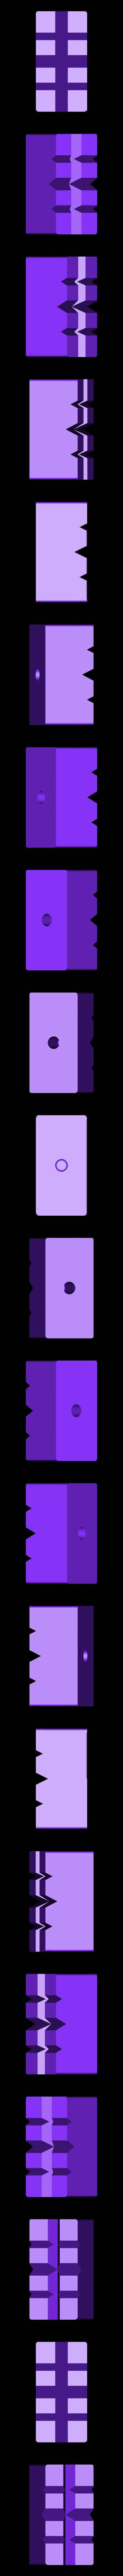 PCB_Clamp.stl Download free STL file PCB Clamp v1.0 • 3D printer template, MuSSy